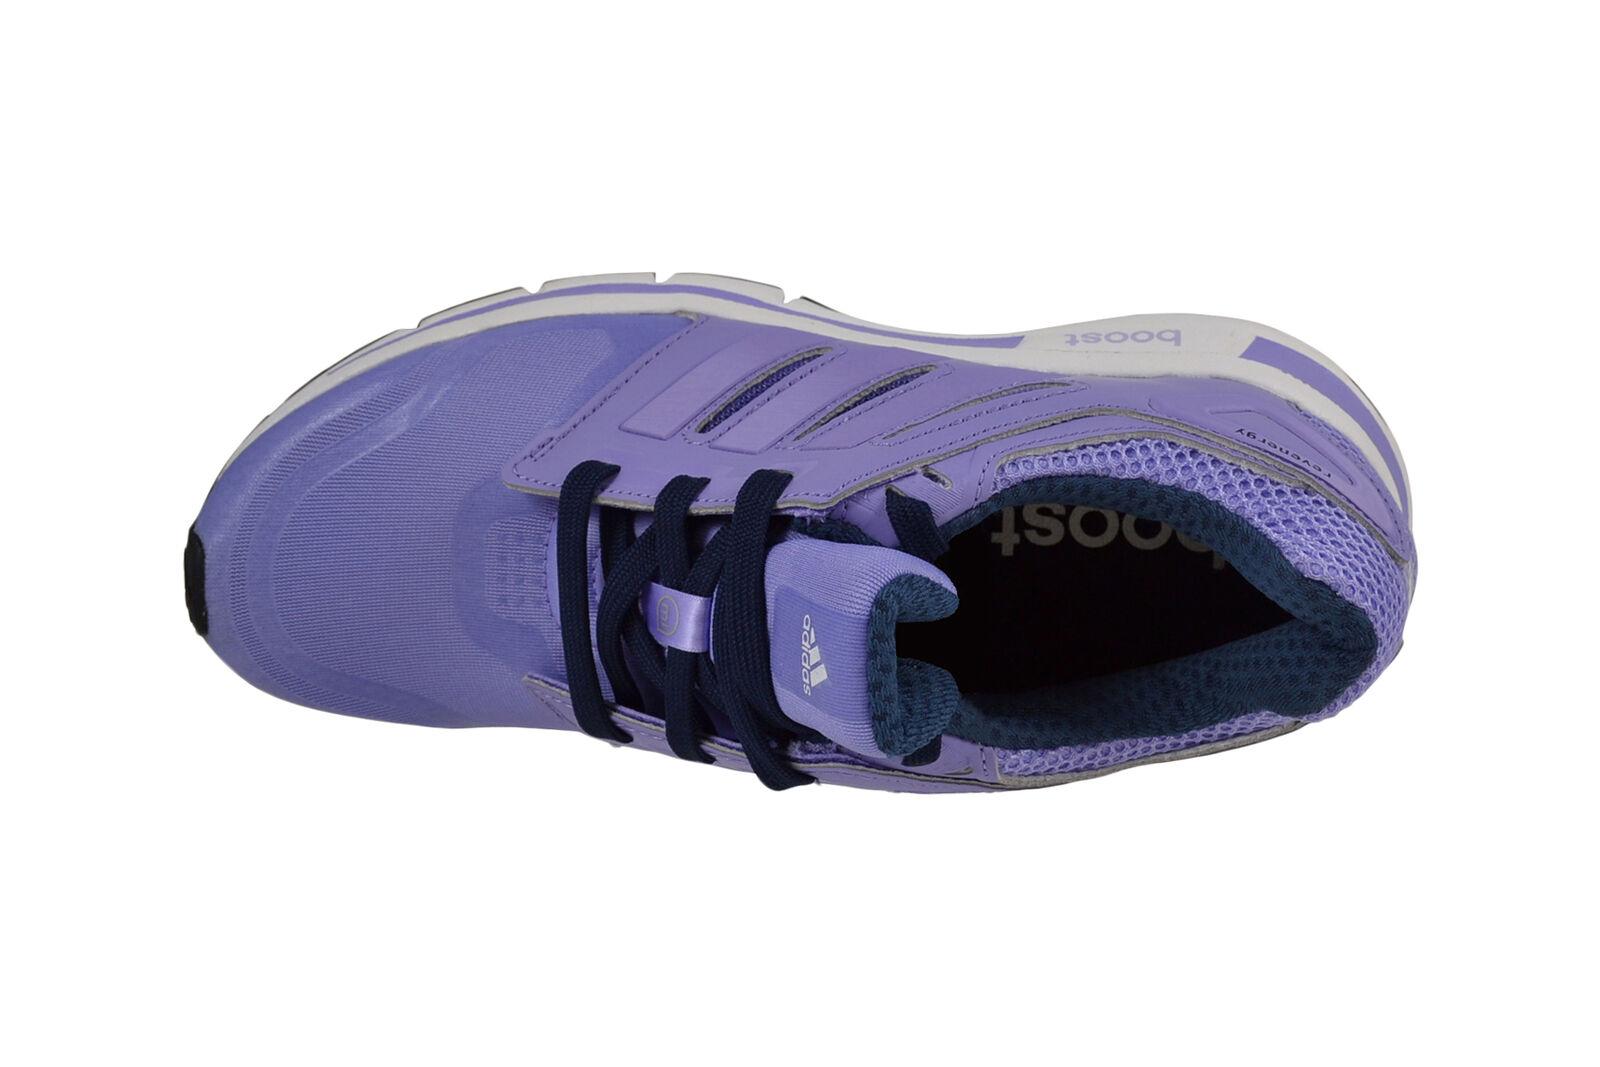 ADIDAS Revenergy Techfit W Glow Glow Glow viola bianca Boost Scarpe da corsa m17441 50e98c